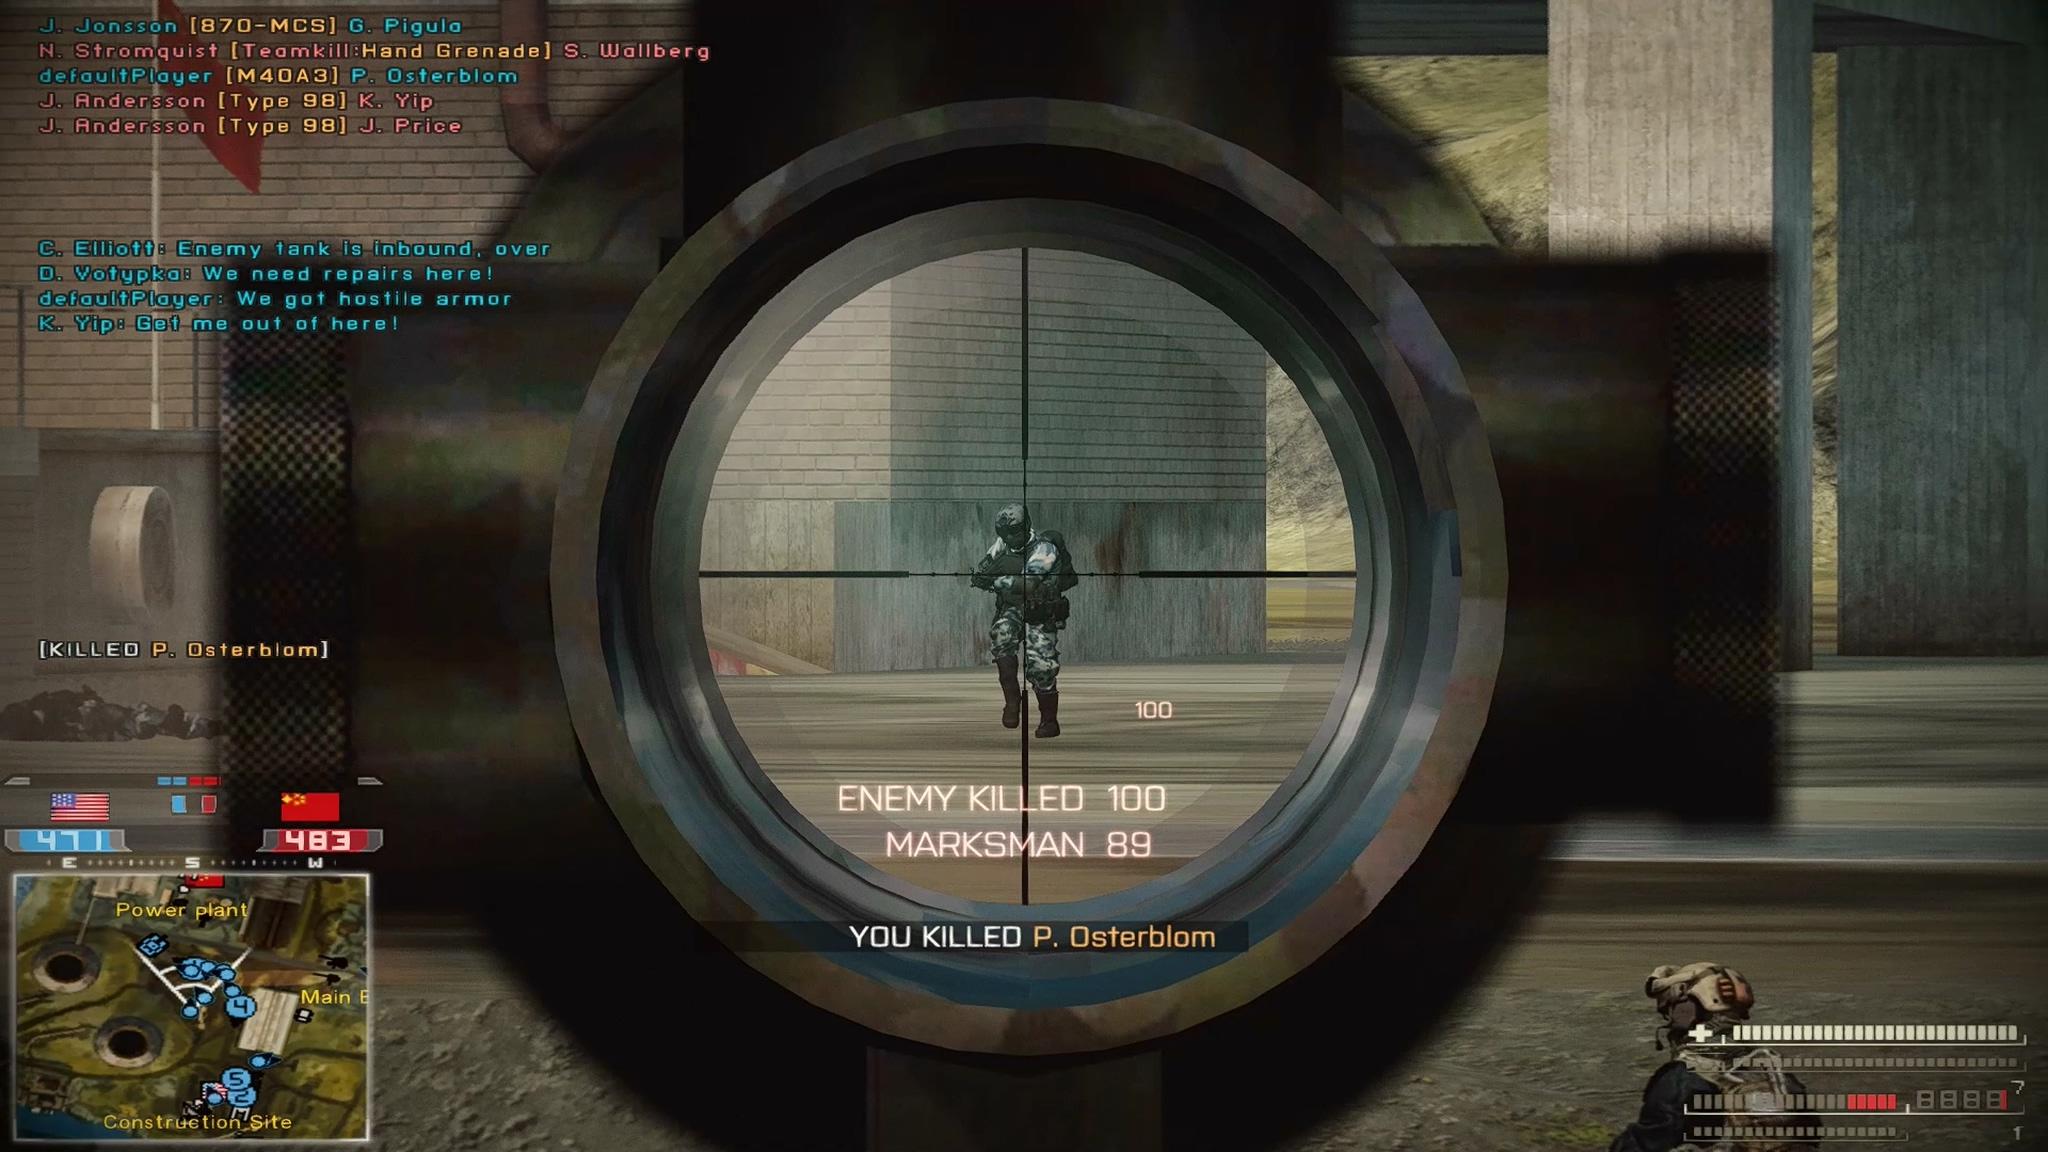 Battlefield 2 05 13 2017   17 47